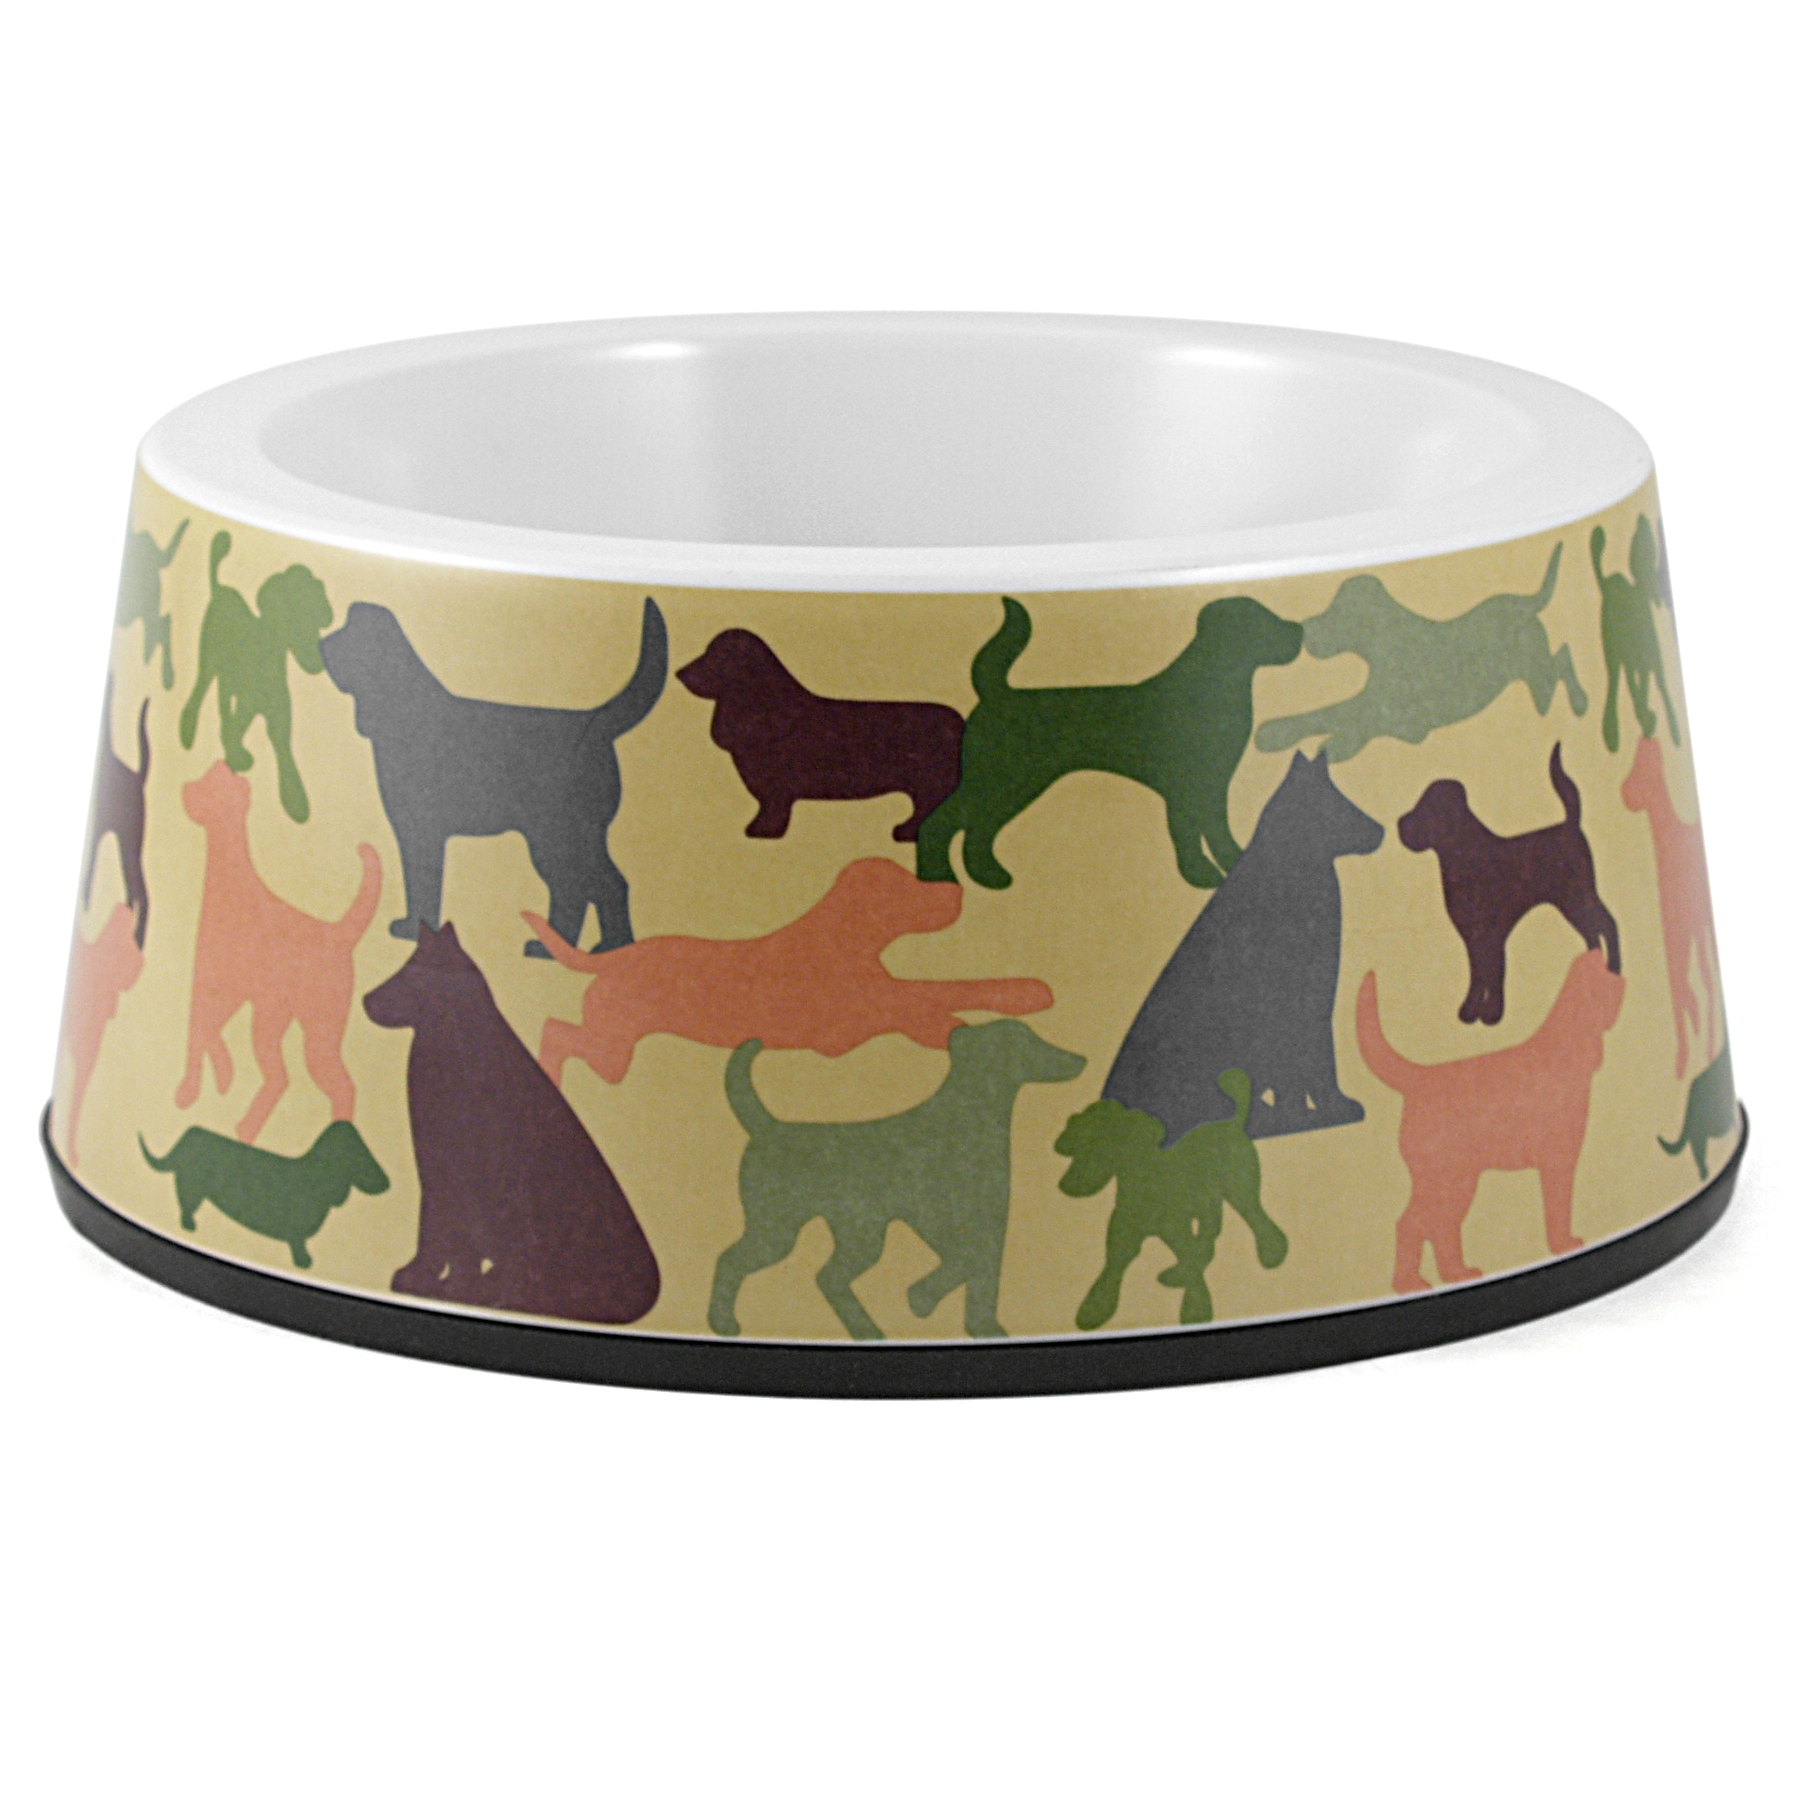 Anchor Hocking Melamine Olive Green 3.5 Cup Dog Bowl